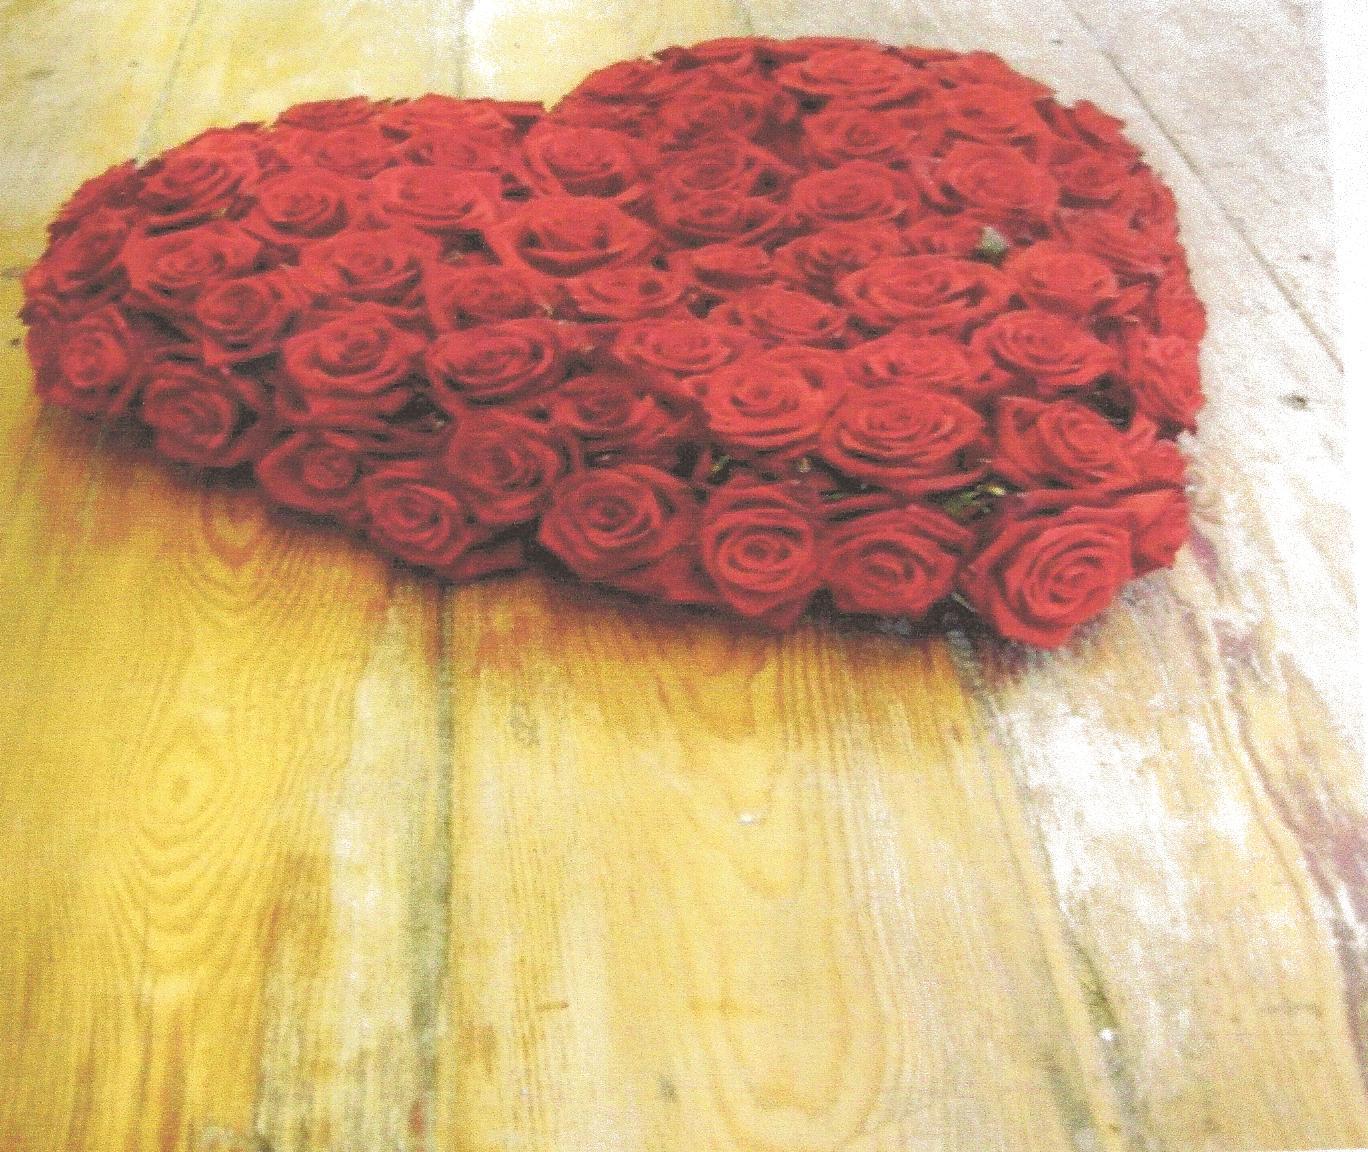 NR 14 hart volledig rode rozen 125 euro